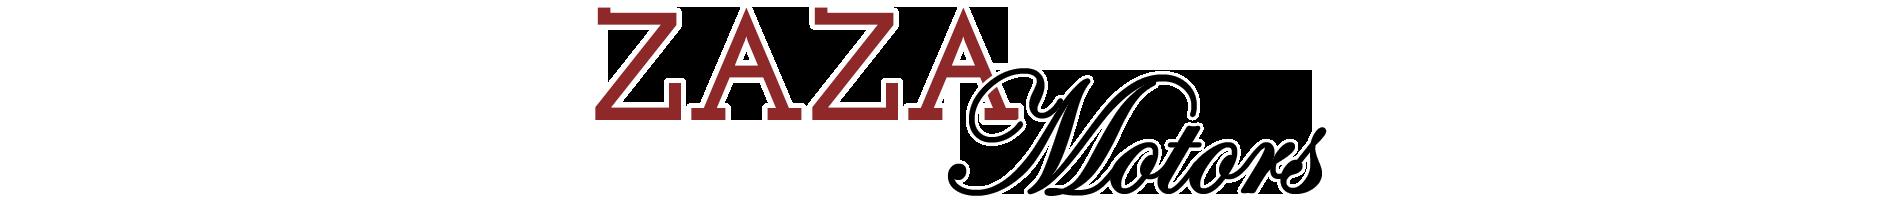 ZaZa Motors